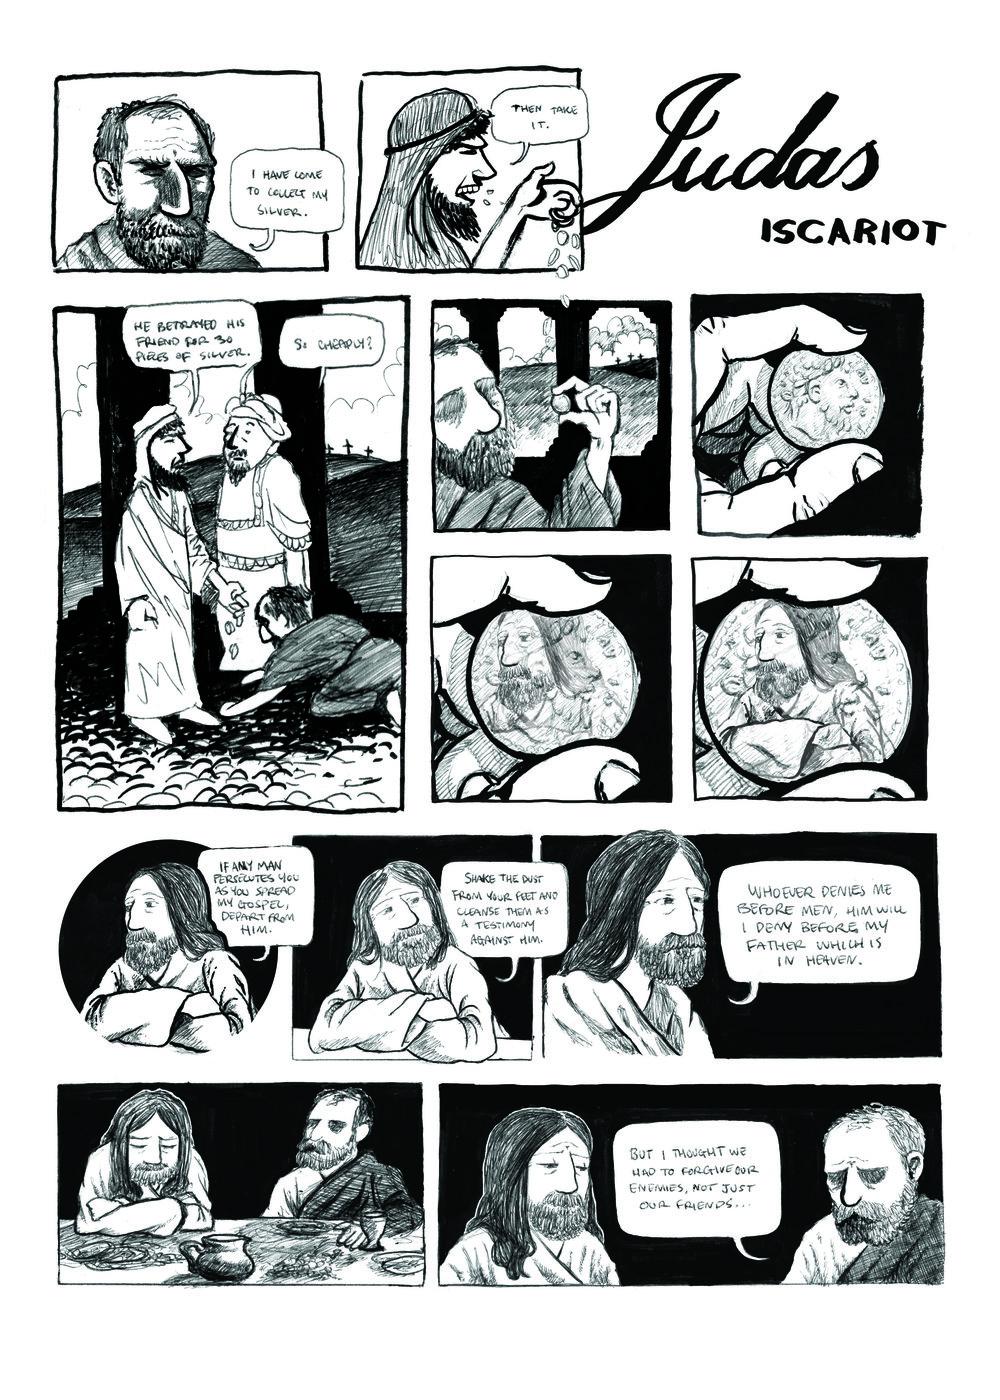 Judas Iscariot A4 p1 v2.jpg